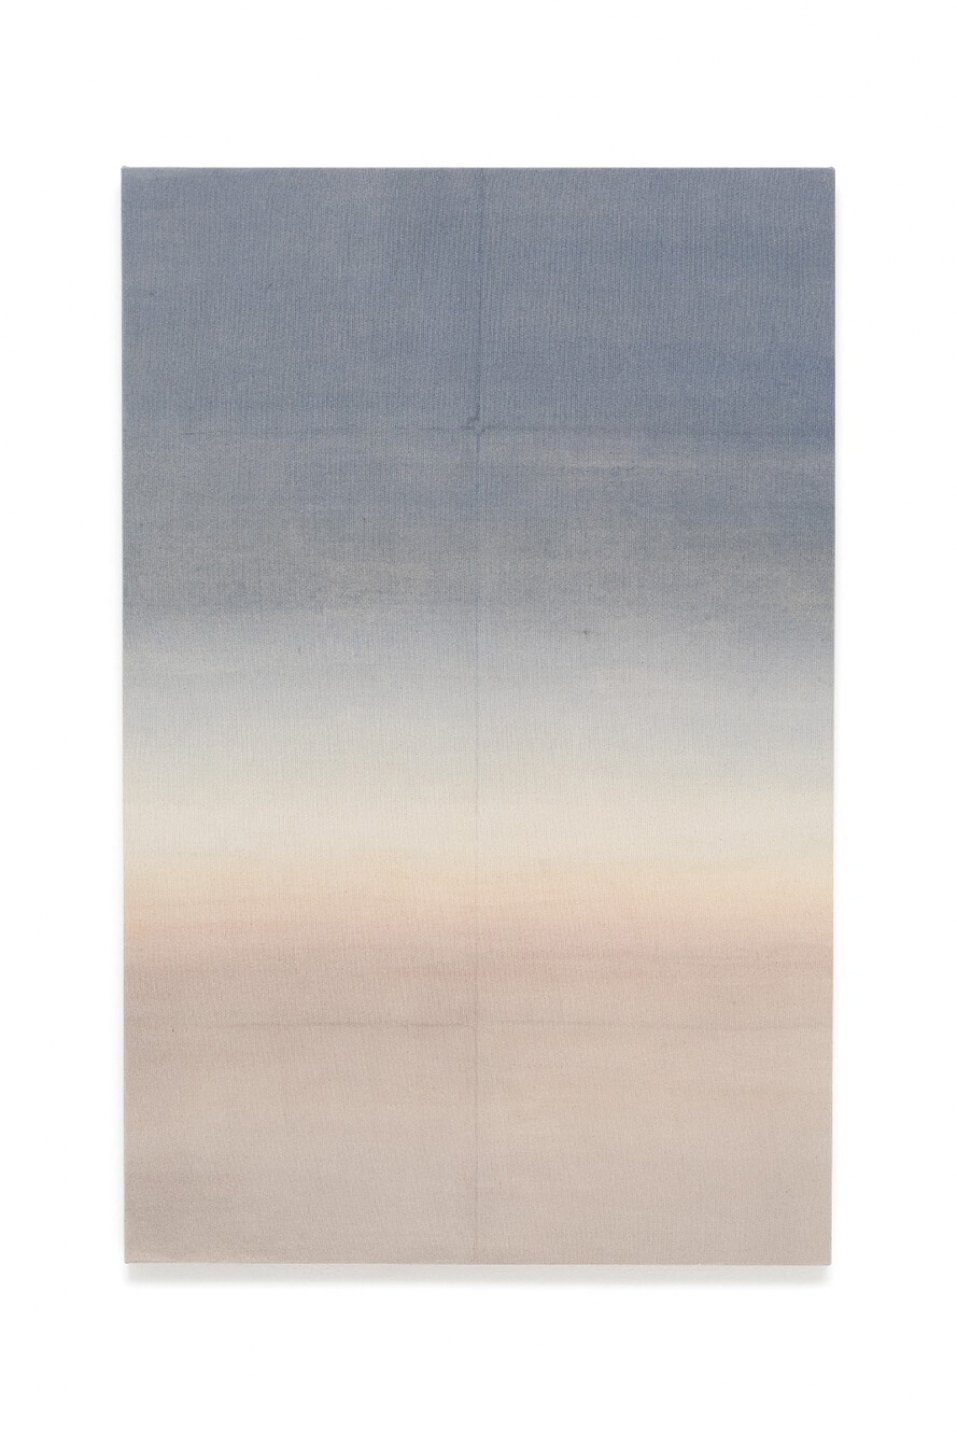 Francesco João Scavarda, <em>untitled,</em> 2017,&nbsp;gouache on canvas, 145 × 94 × 4 cm - Mendes Wood DM